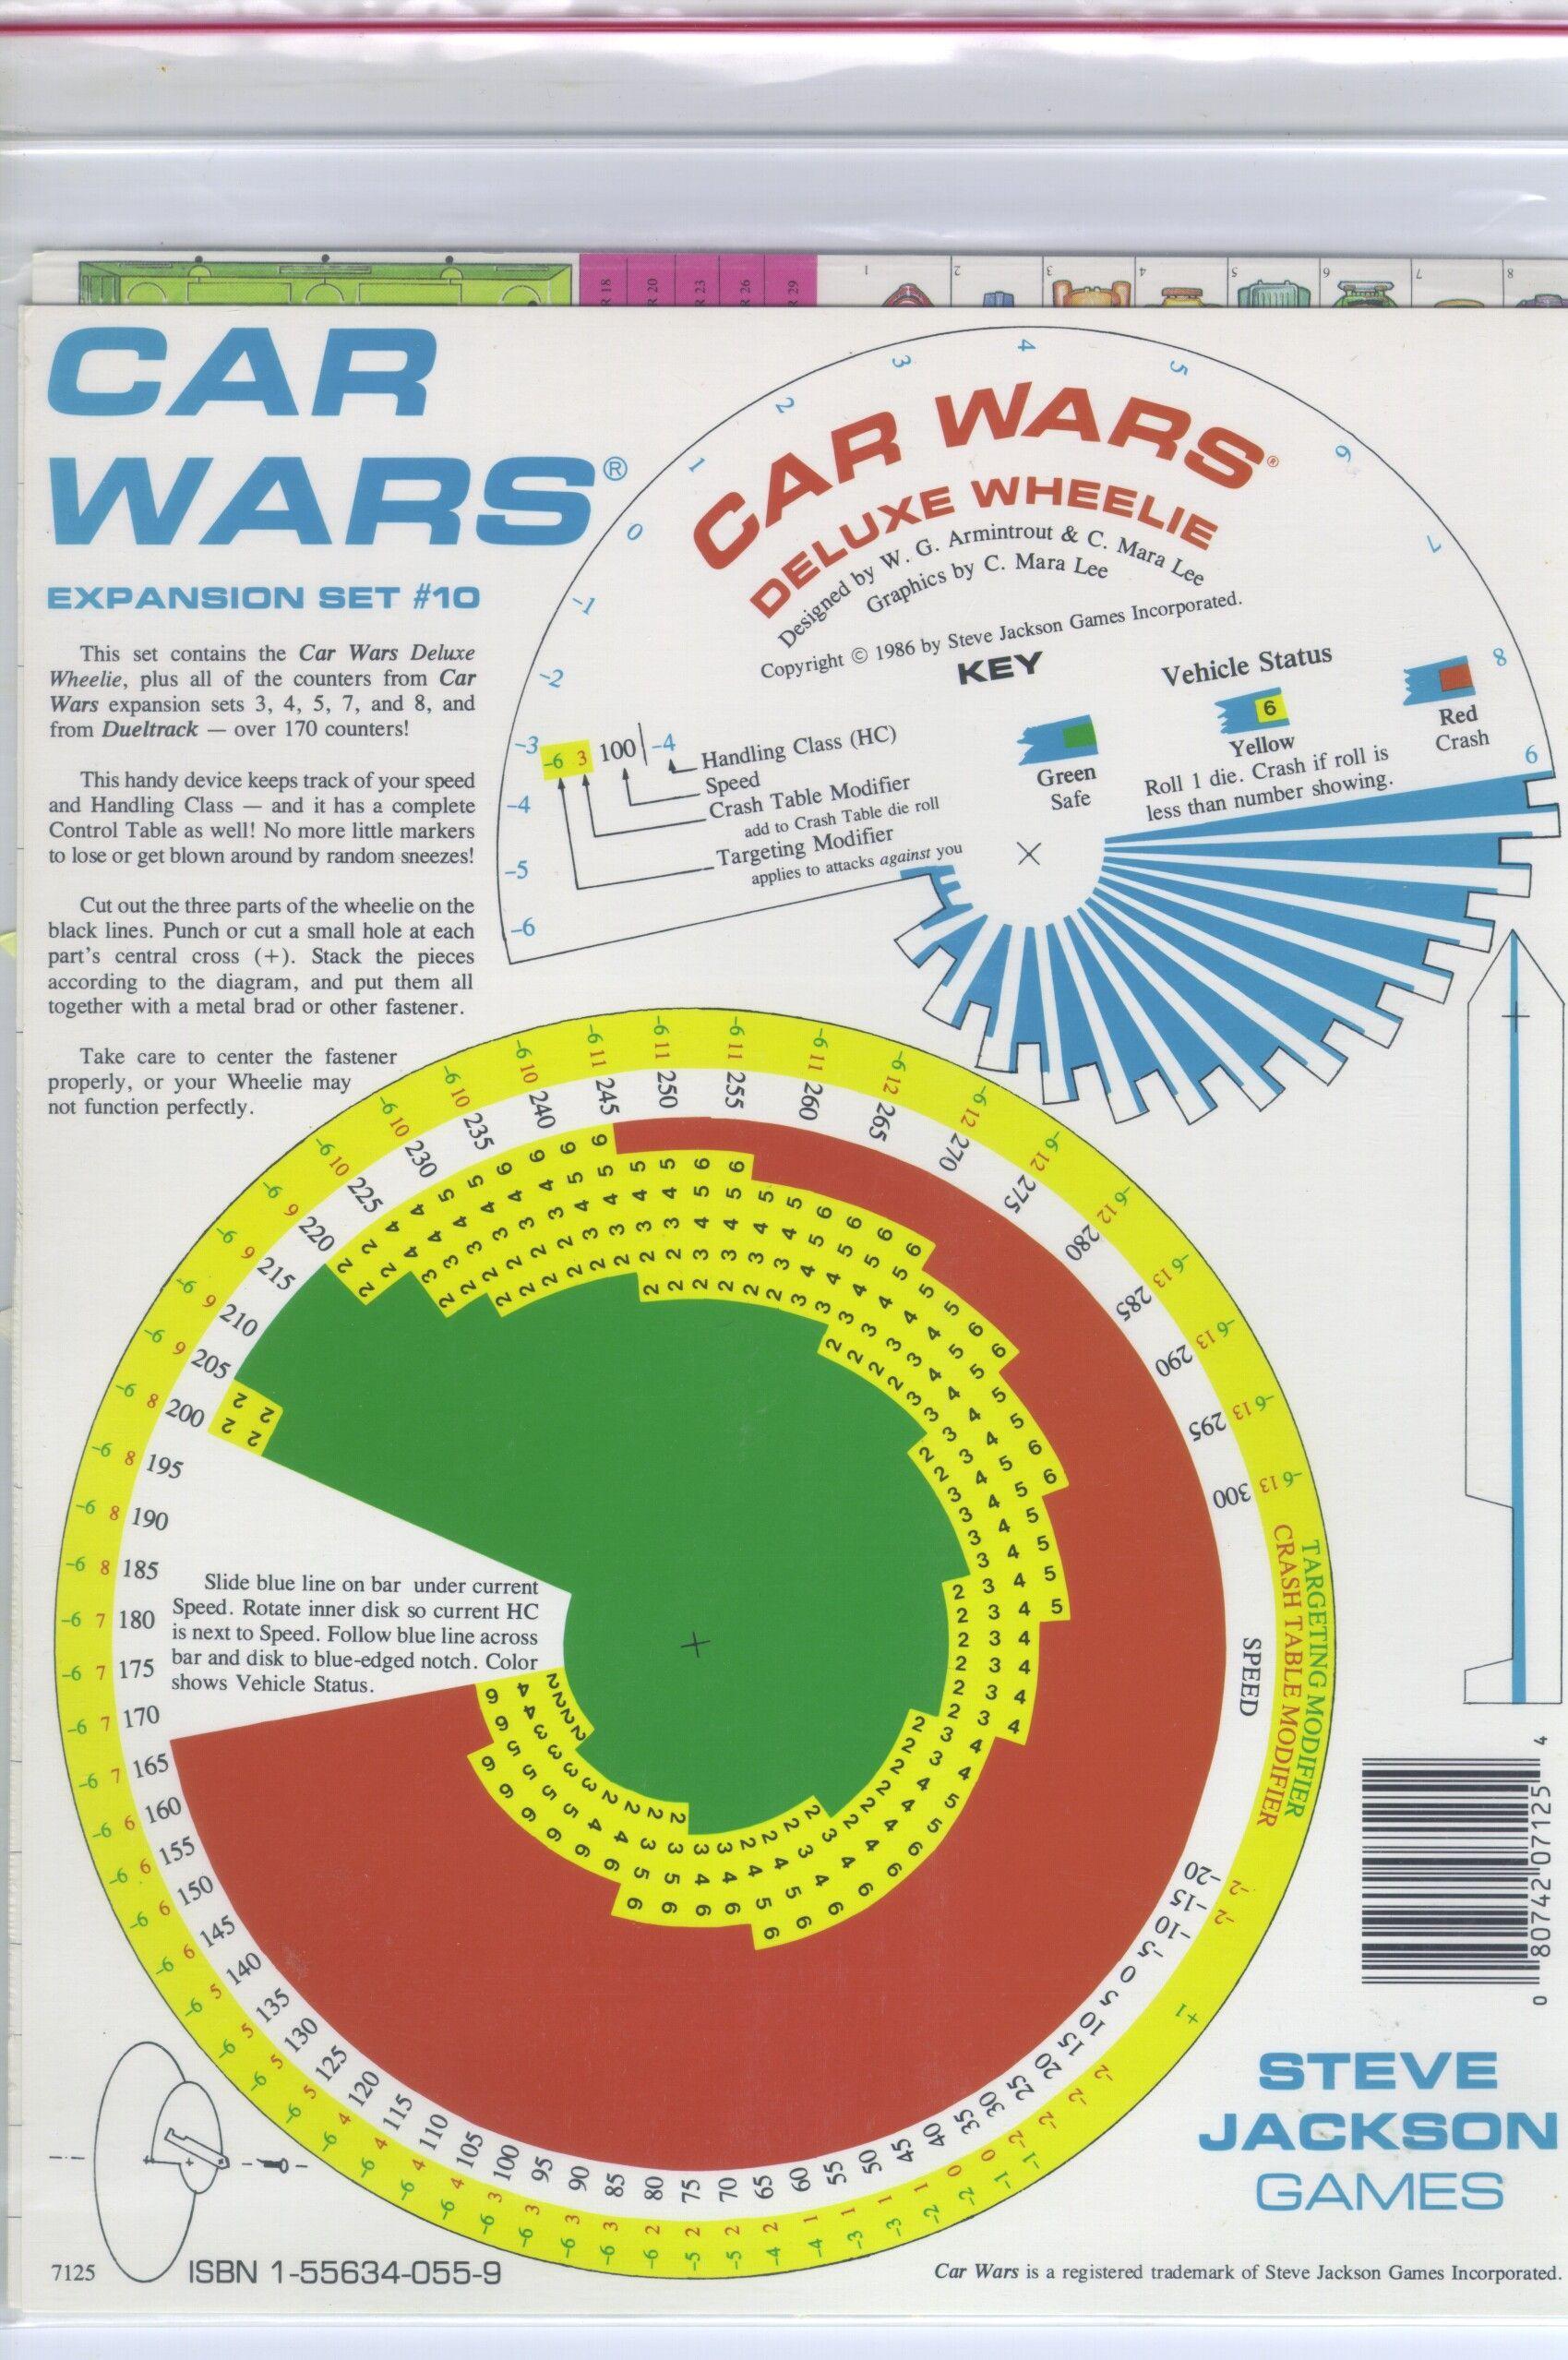 Car Wars Expansion Set #10